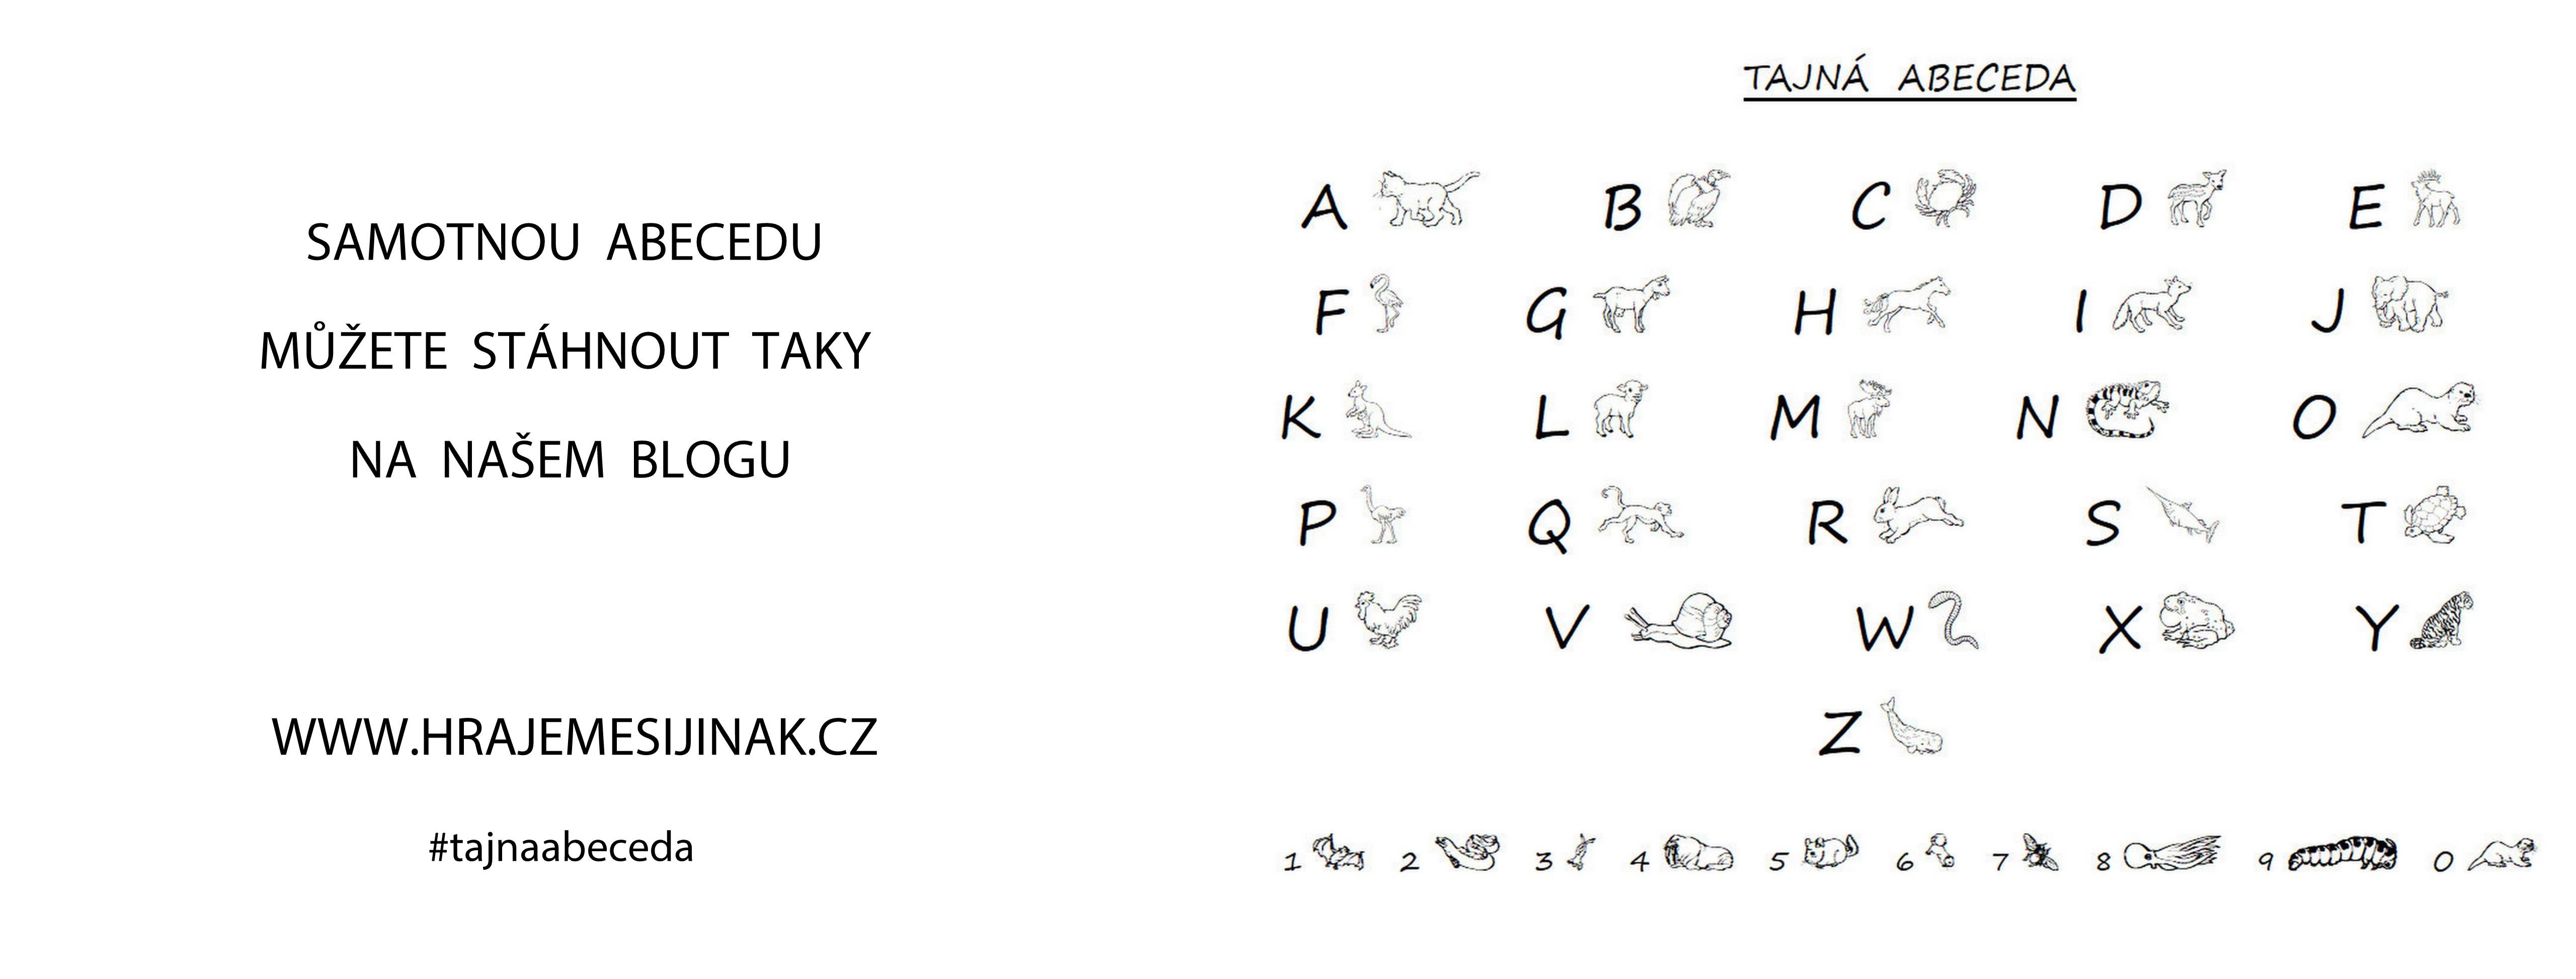 Chci jenom abecedu